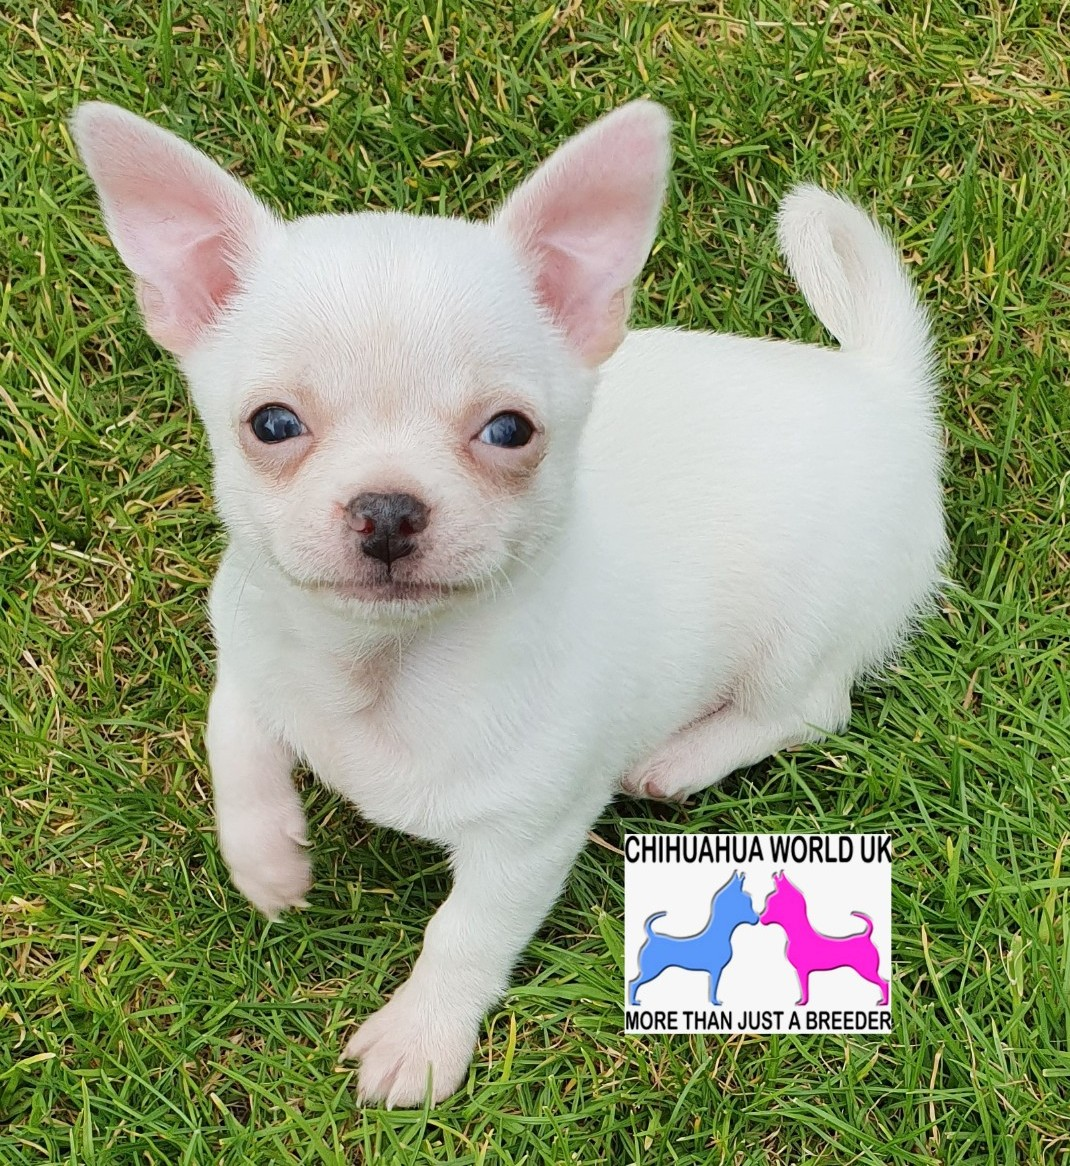 Chihuahua World UK - Chihuahua Breeding